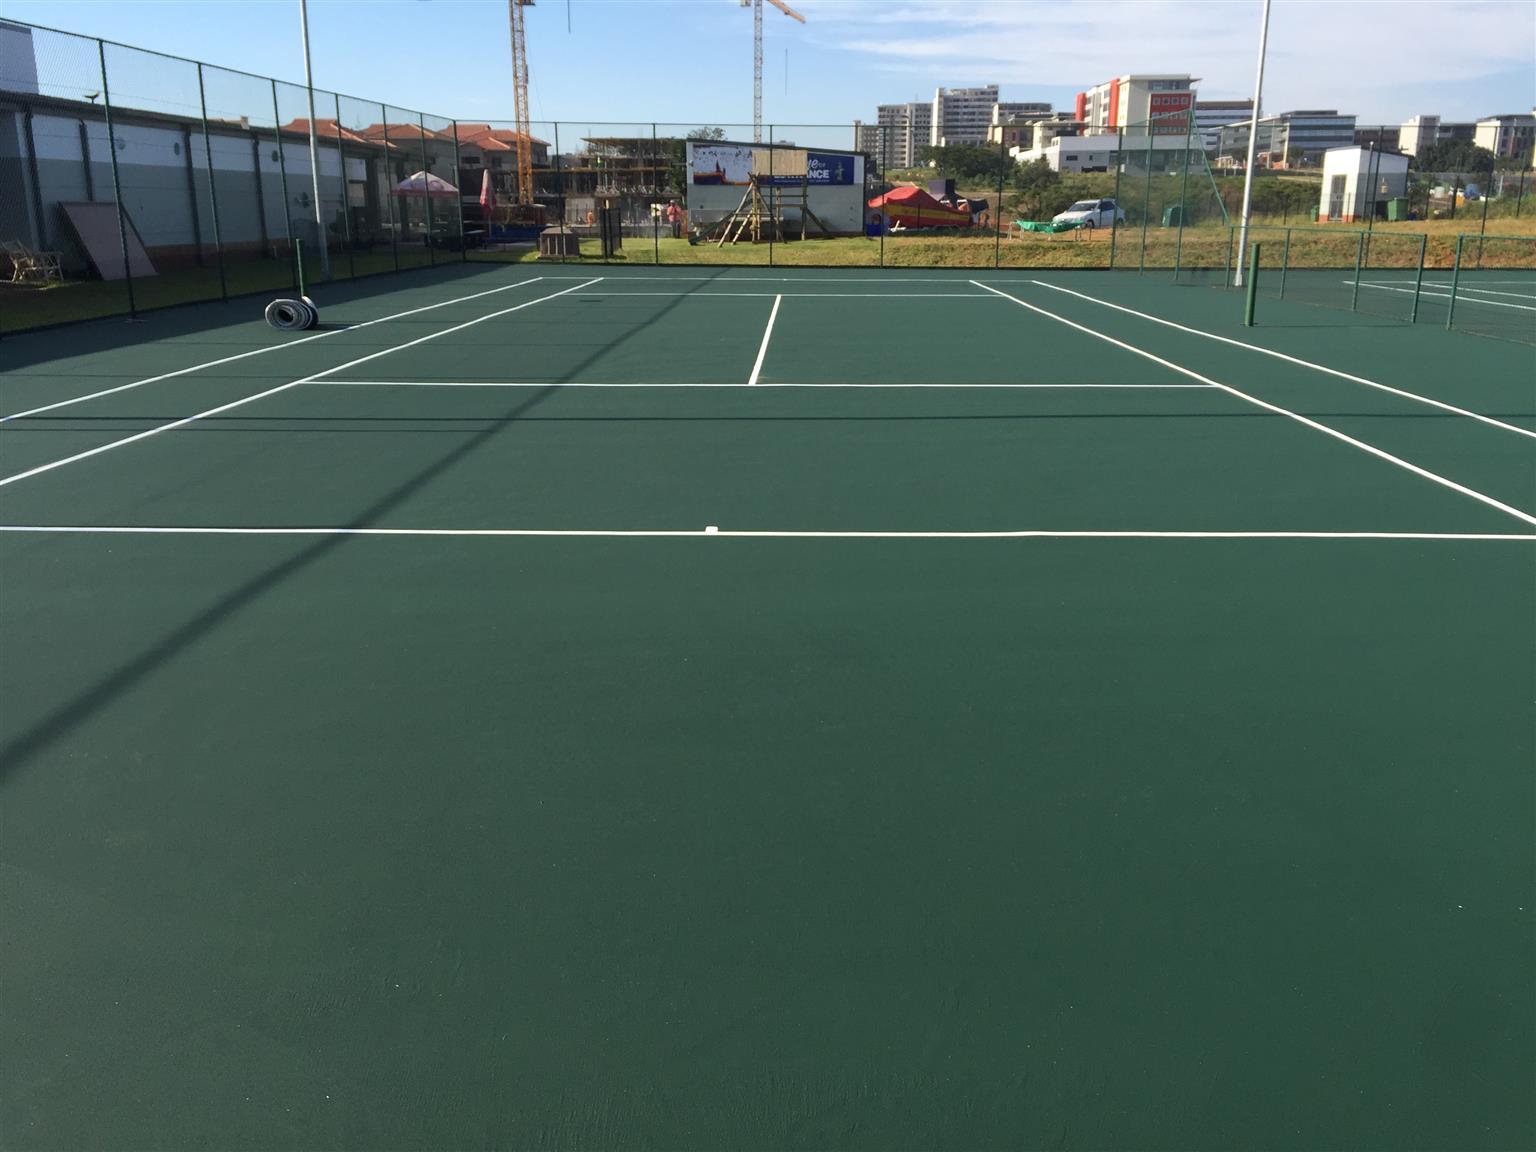 Tennis court construction, Tennis court repairs, Tennis Court Resurfacing